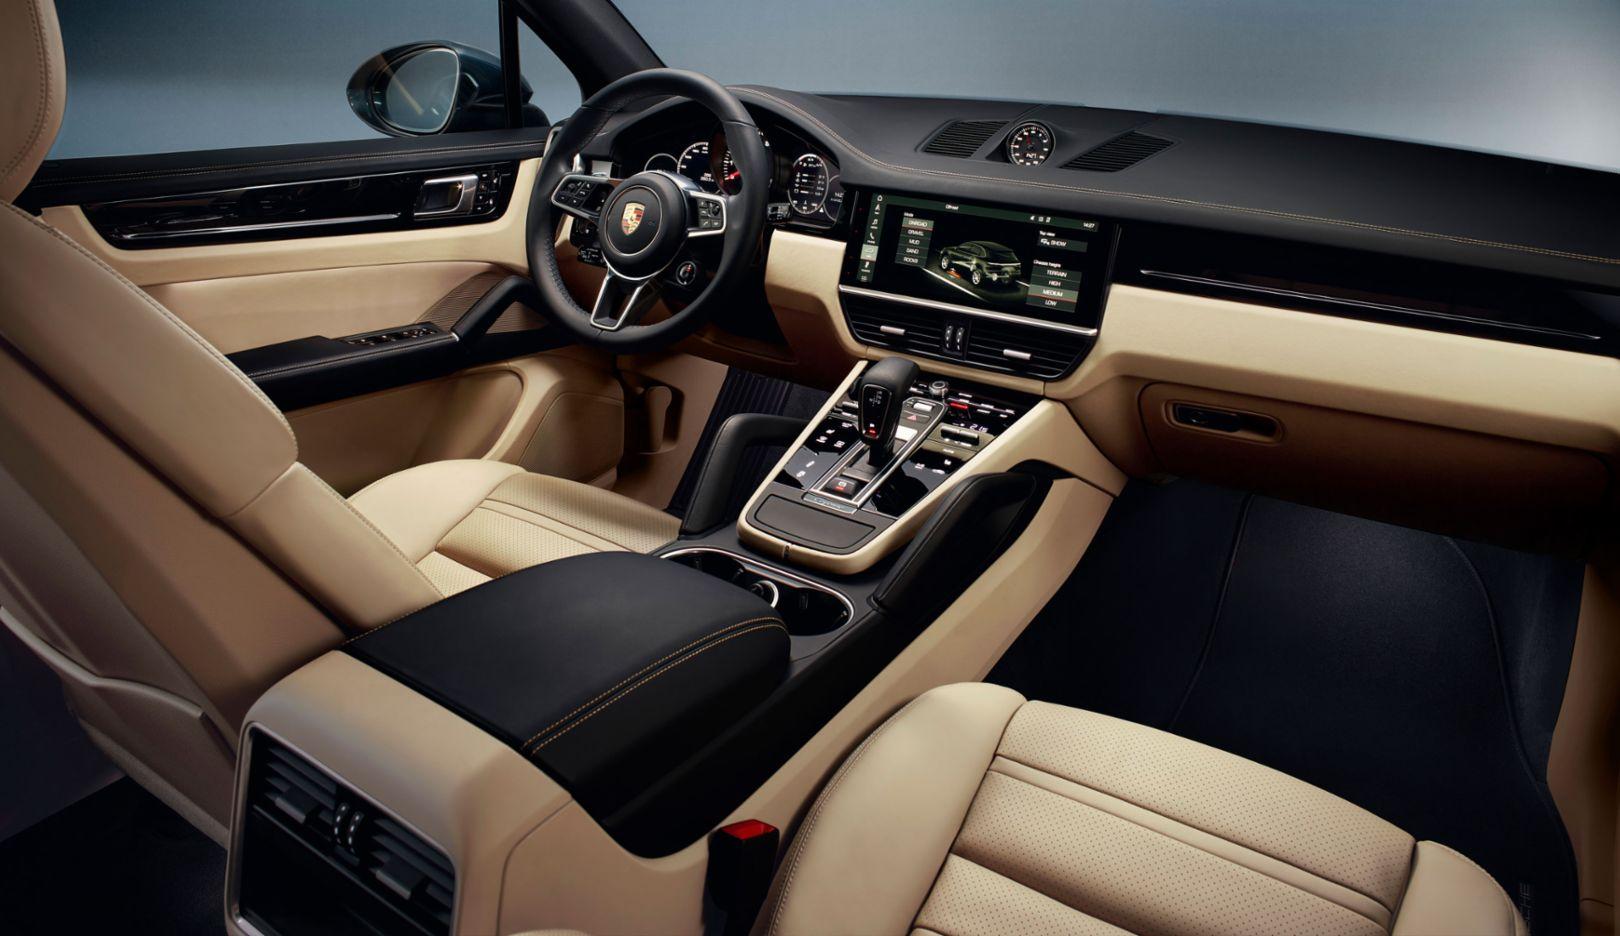 Digital evolution: Porsche Advanced Cockpit and new PCM